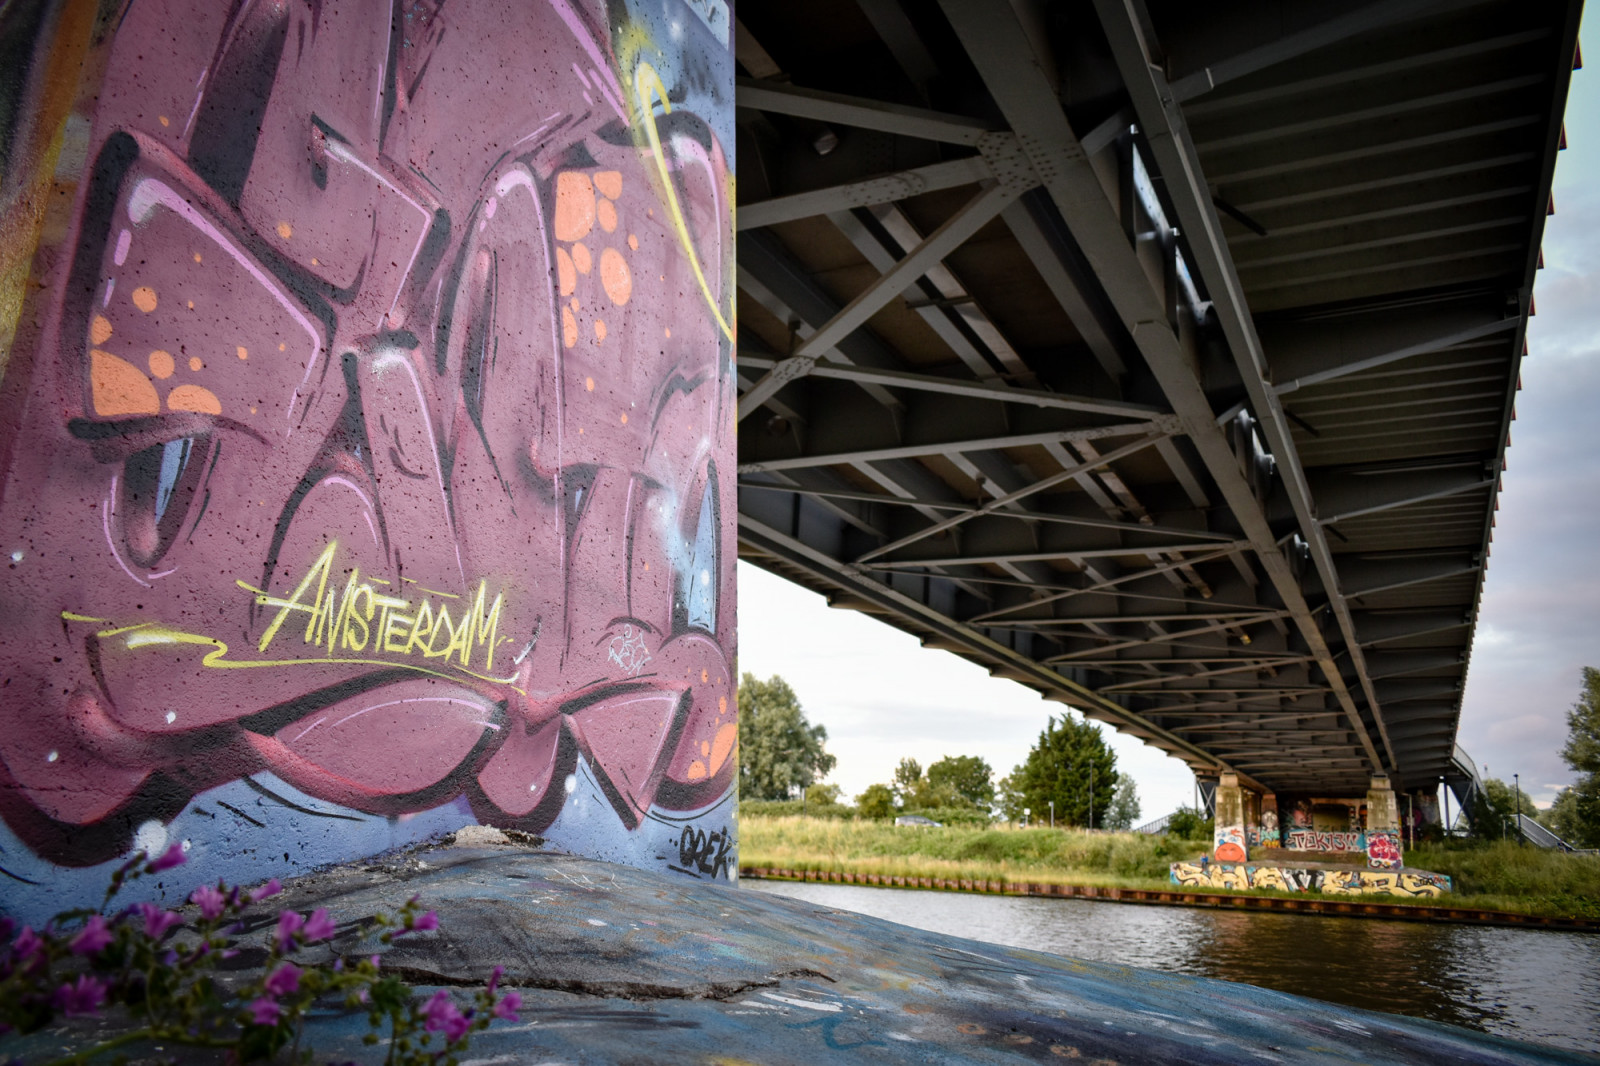 Graffiti under bridge in Amsterdam